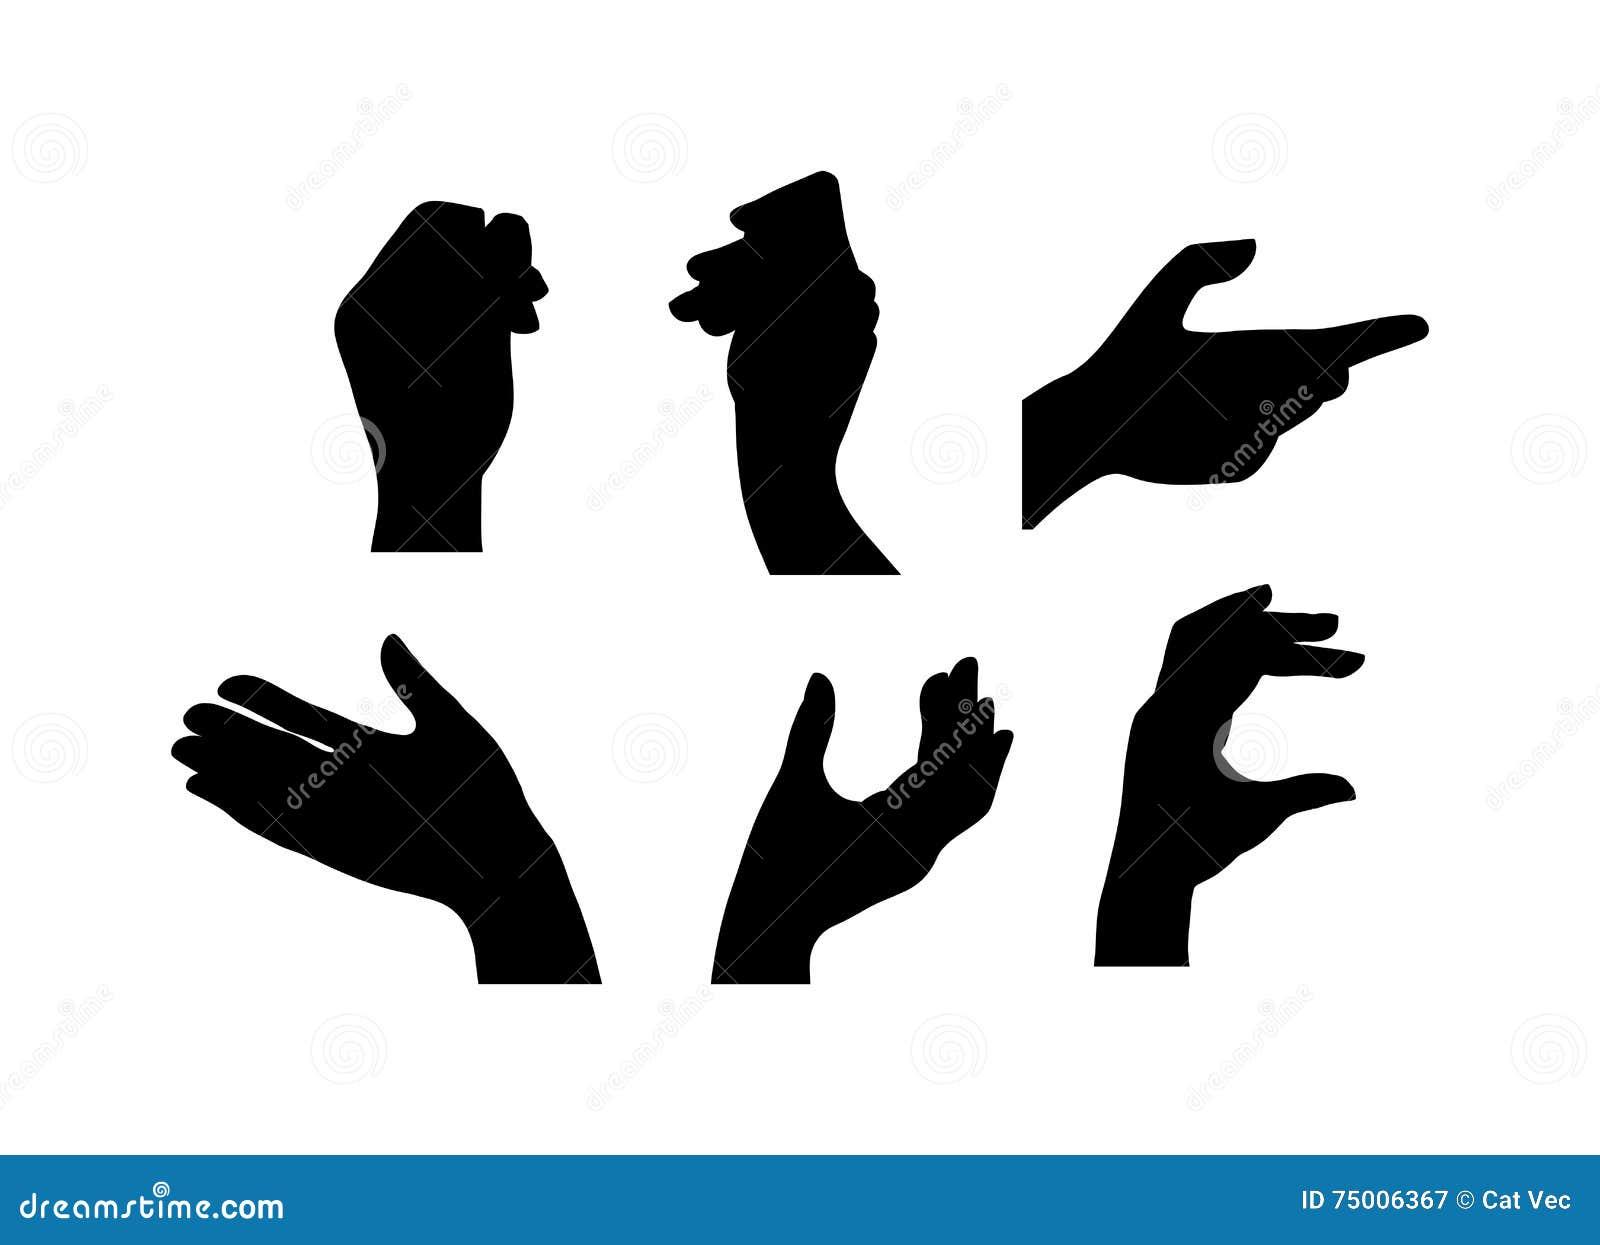 Silhouette Hands Symbols Vector Illustration Stock Vector